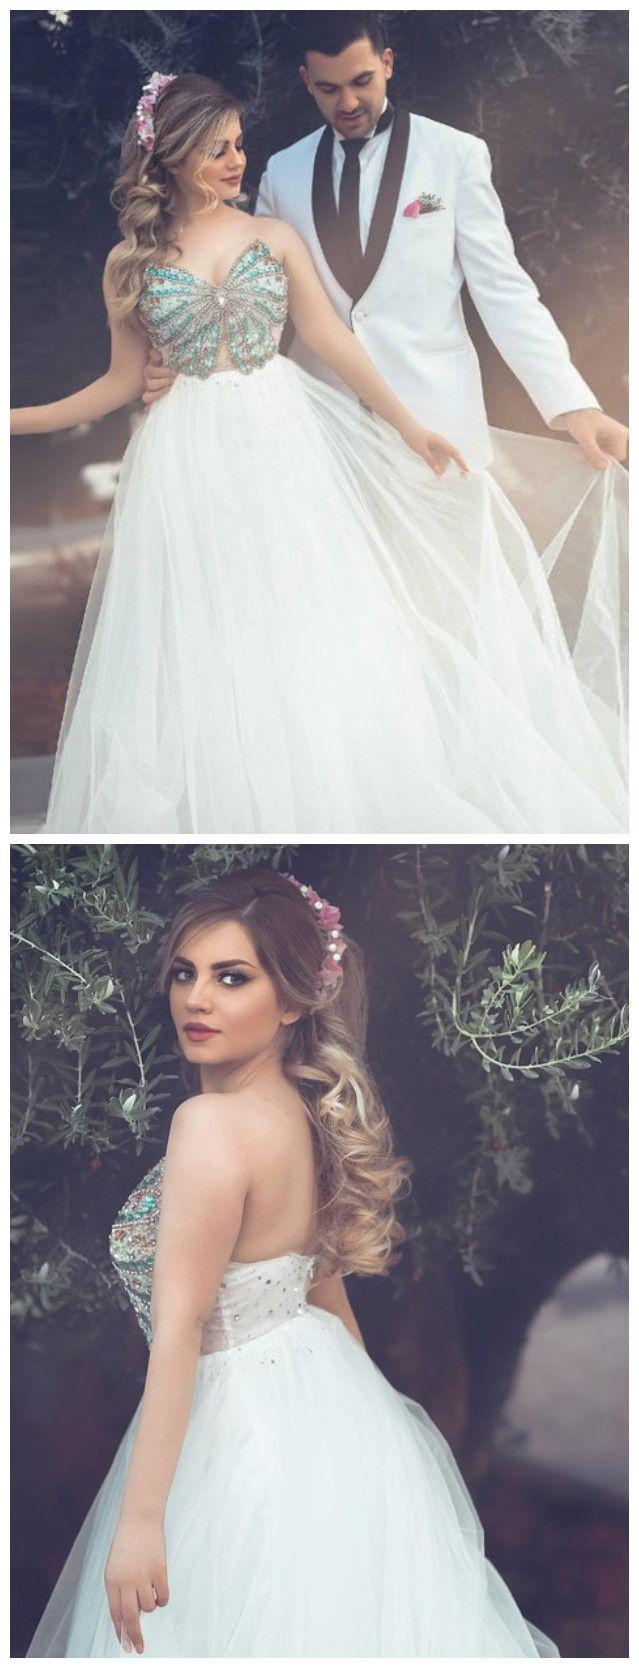 Prom dresses longprom dresses modest prom dressprom dresses